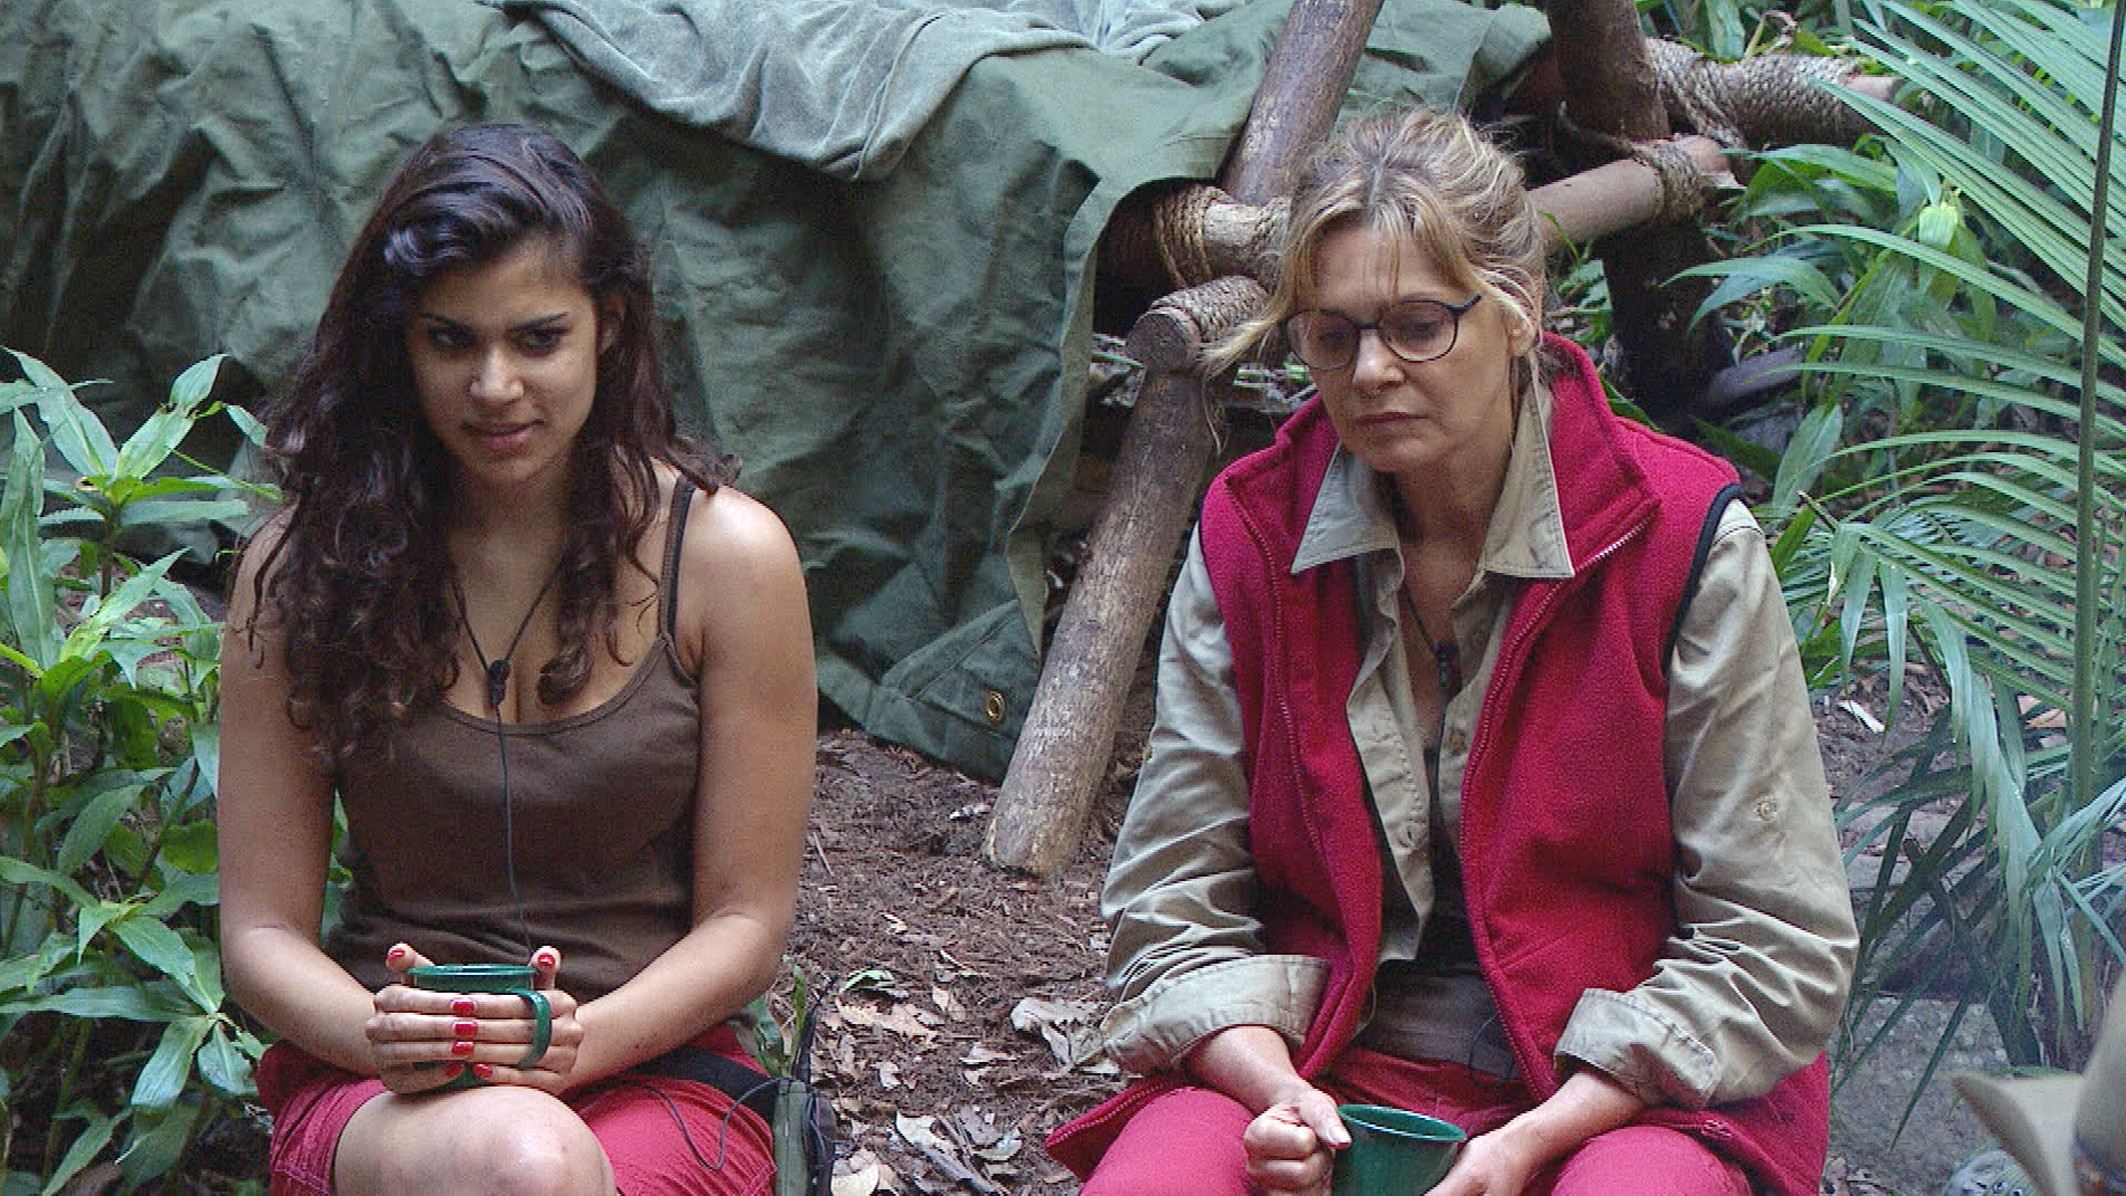 Walter-Freiwald-Auszug-Dschungelcamp-2015-noch-immer-Thema-Tag-15